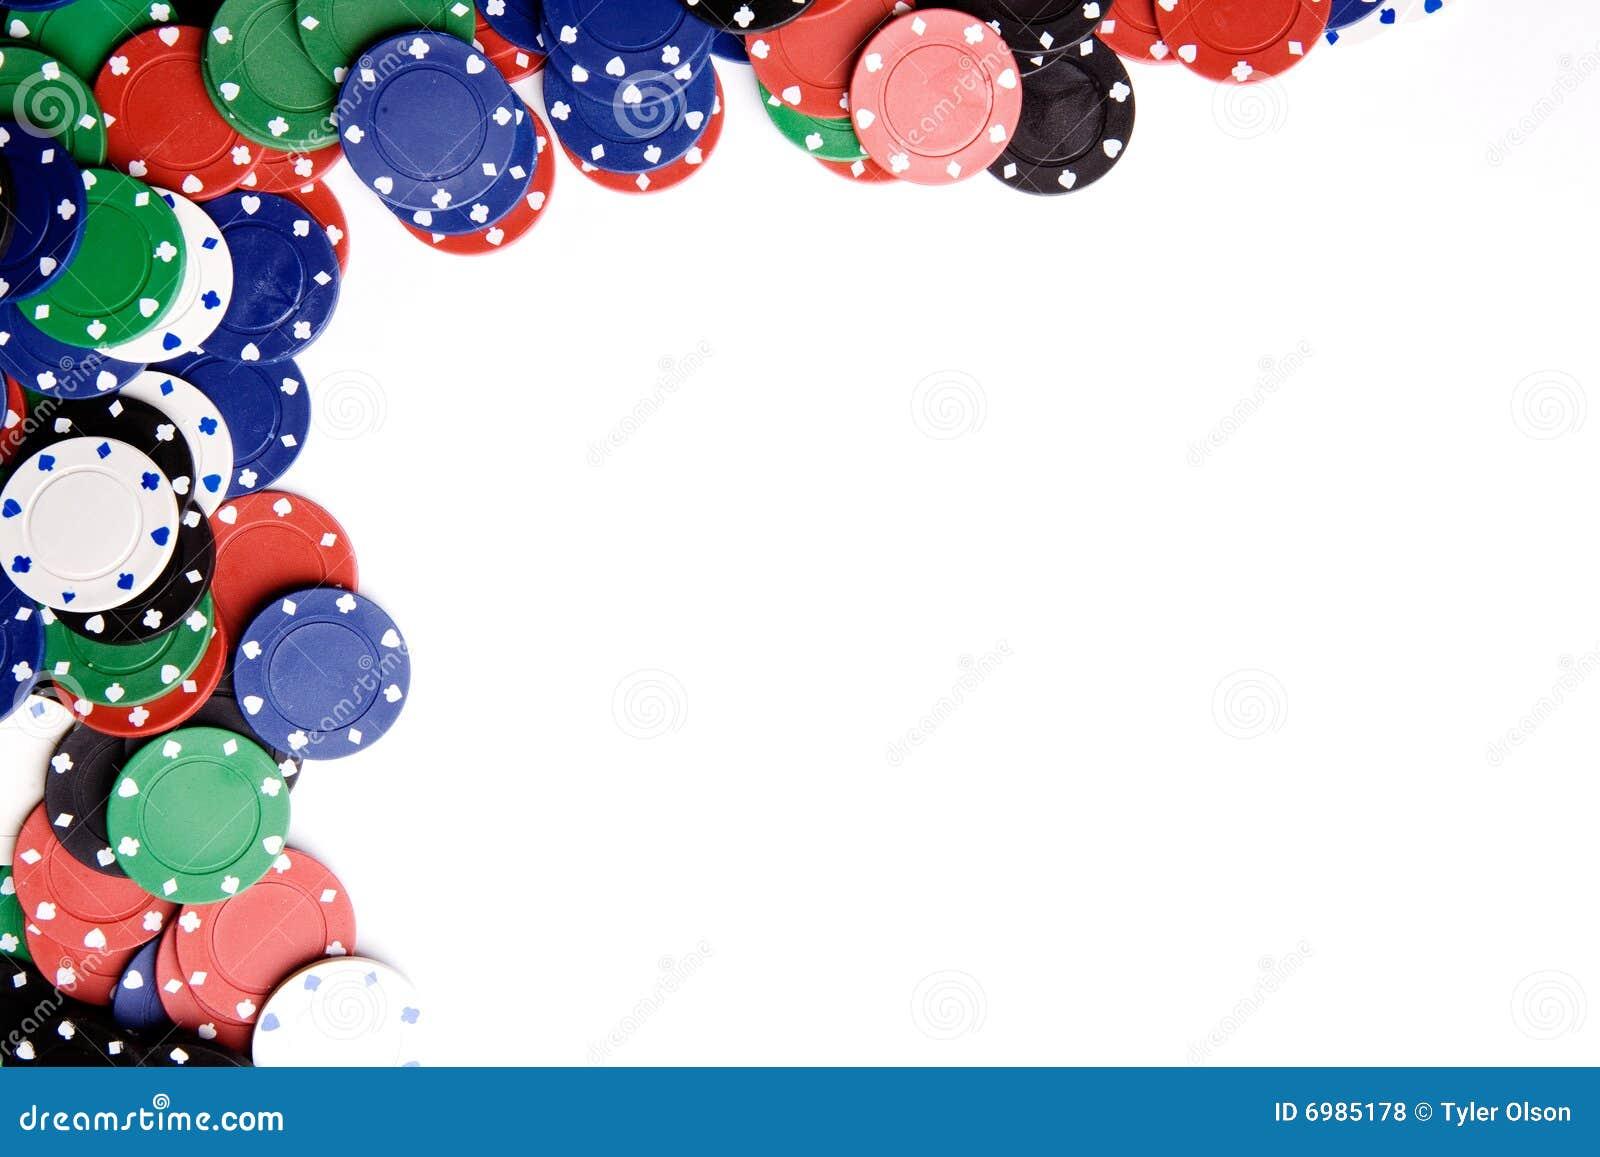 Casino Chip Background Royalty Free Stock Photos Image